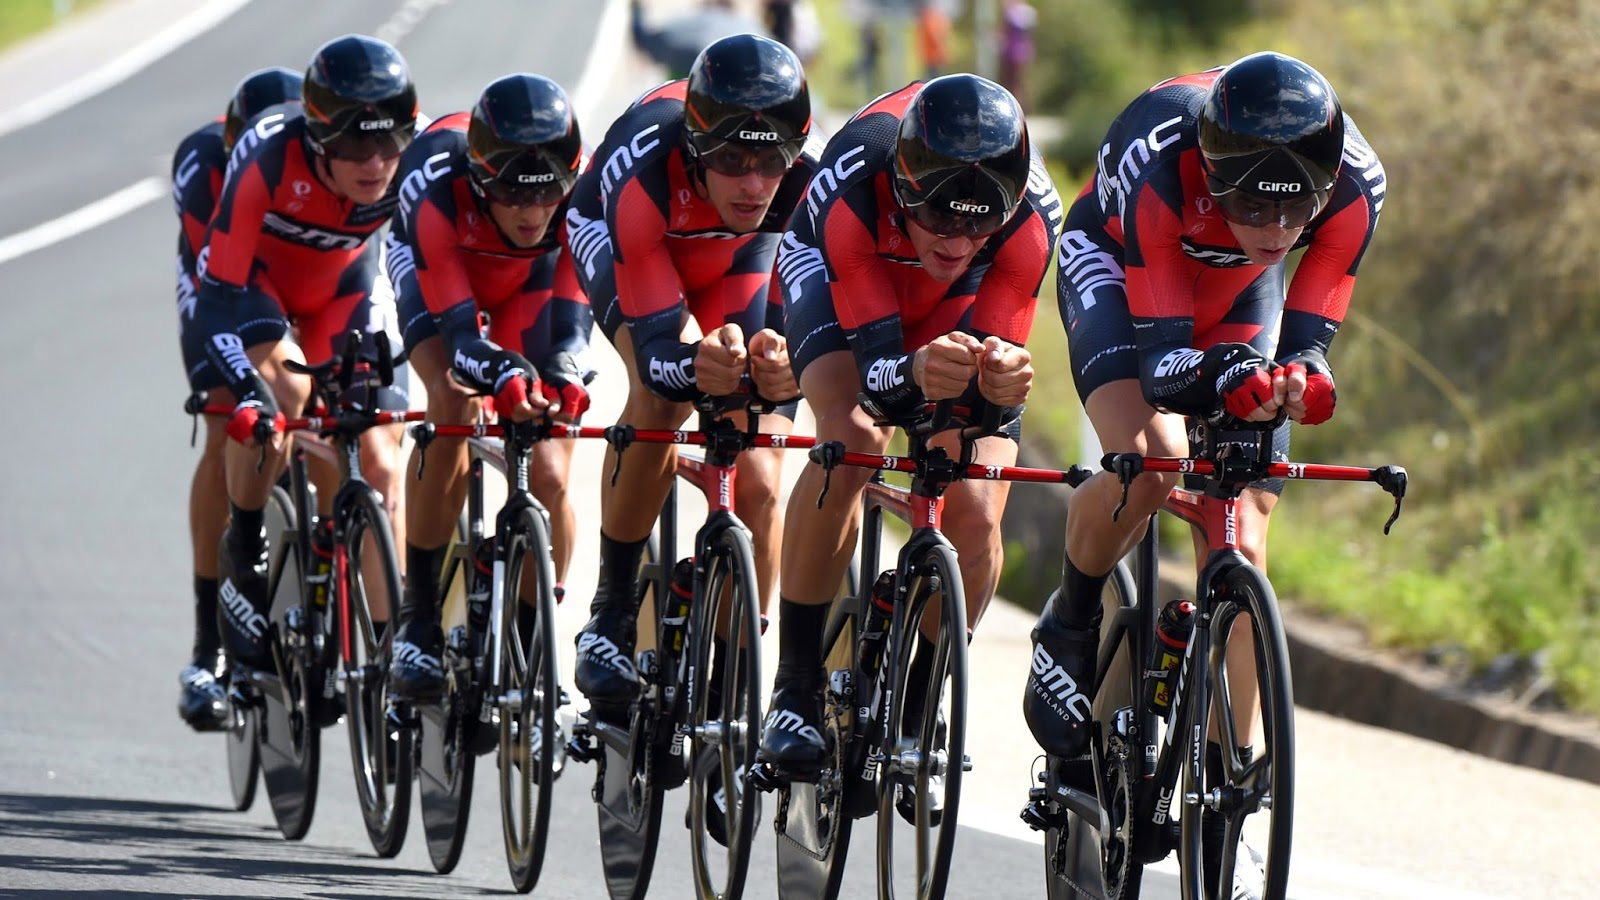 Campeonatos del mundo ciclismo 2014 contrareloj equipos for Equipos de ciclismo